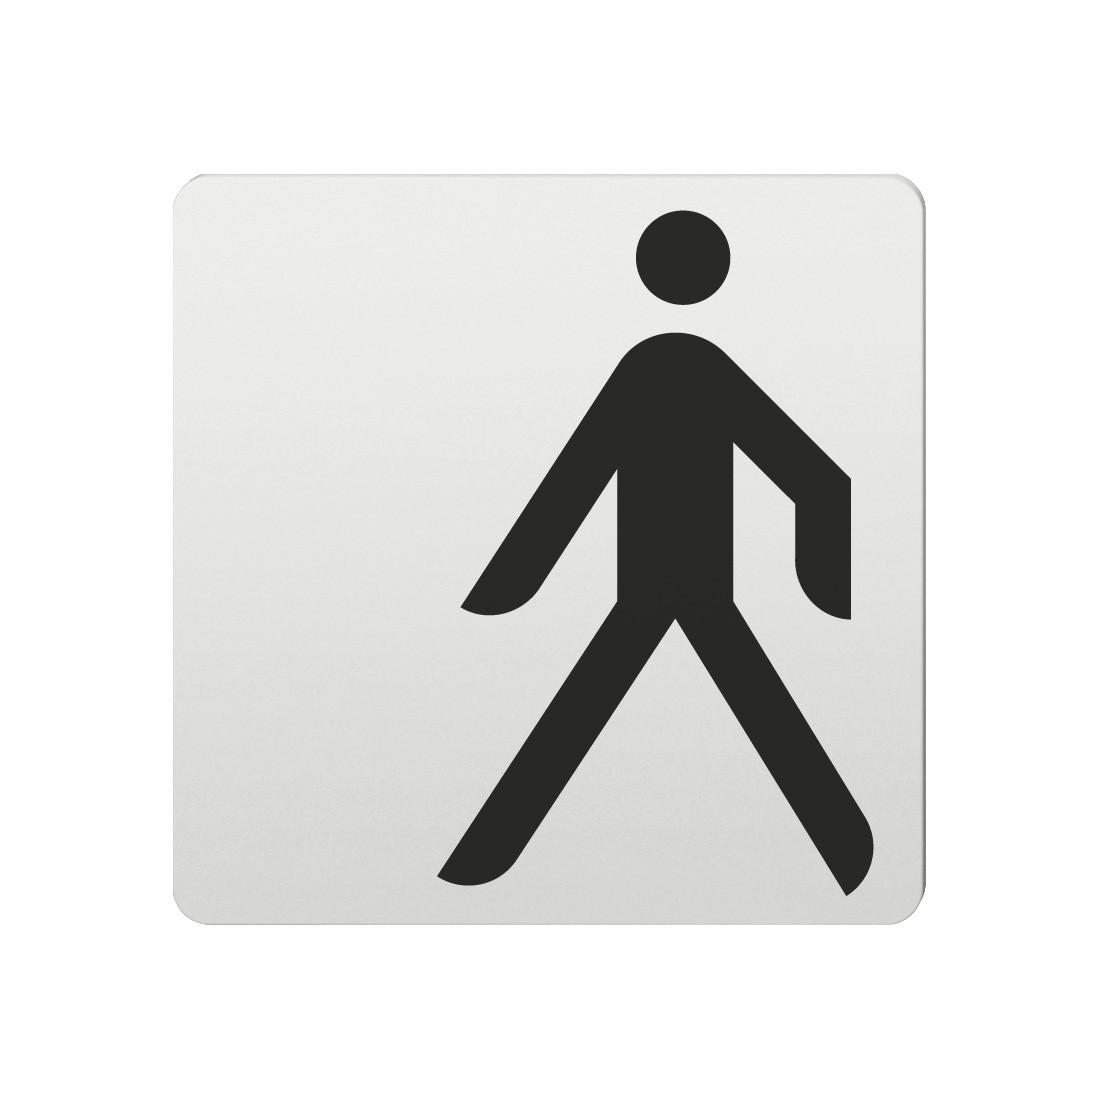 FSB Hinweiszeichen Fussgaenger Lasergraviert Aluminium naturfarbig (0 36 4059 00010 0105)